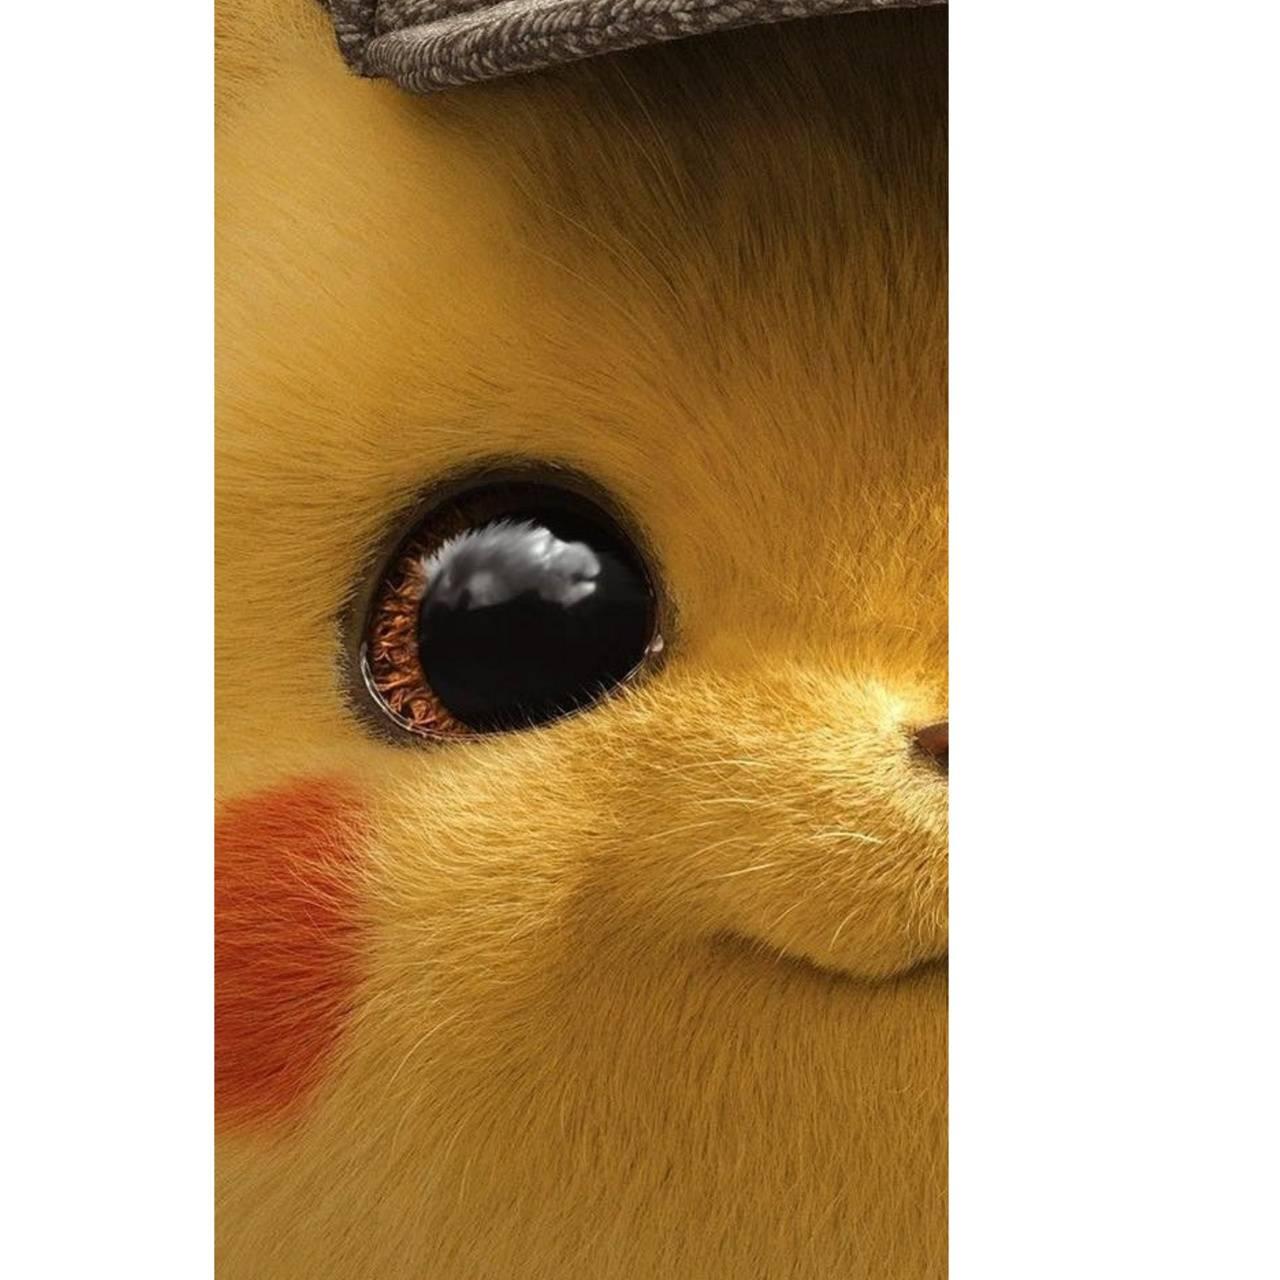 Detective pikachu 4k